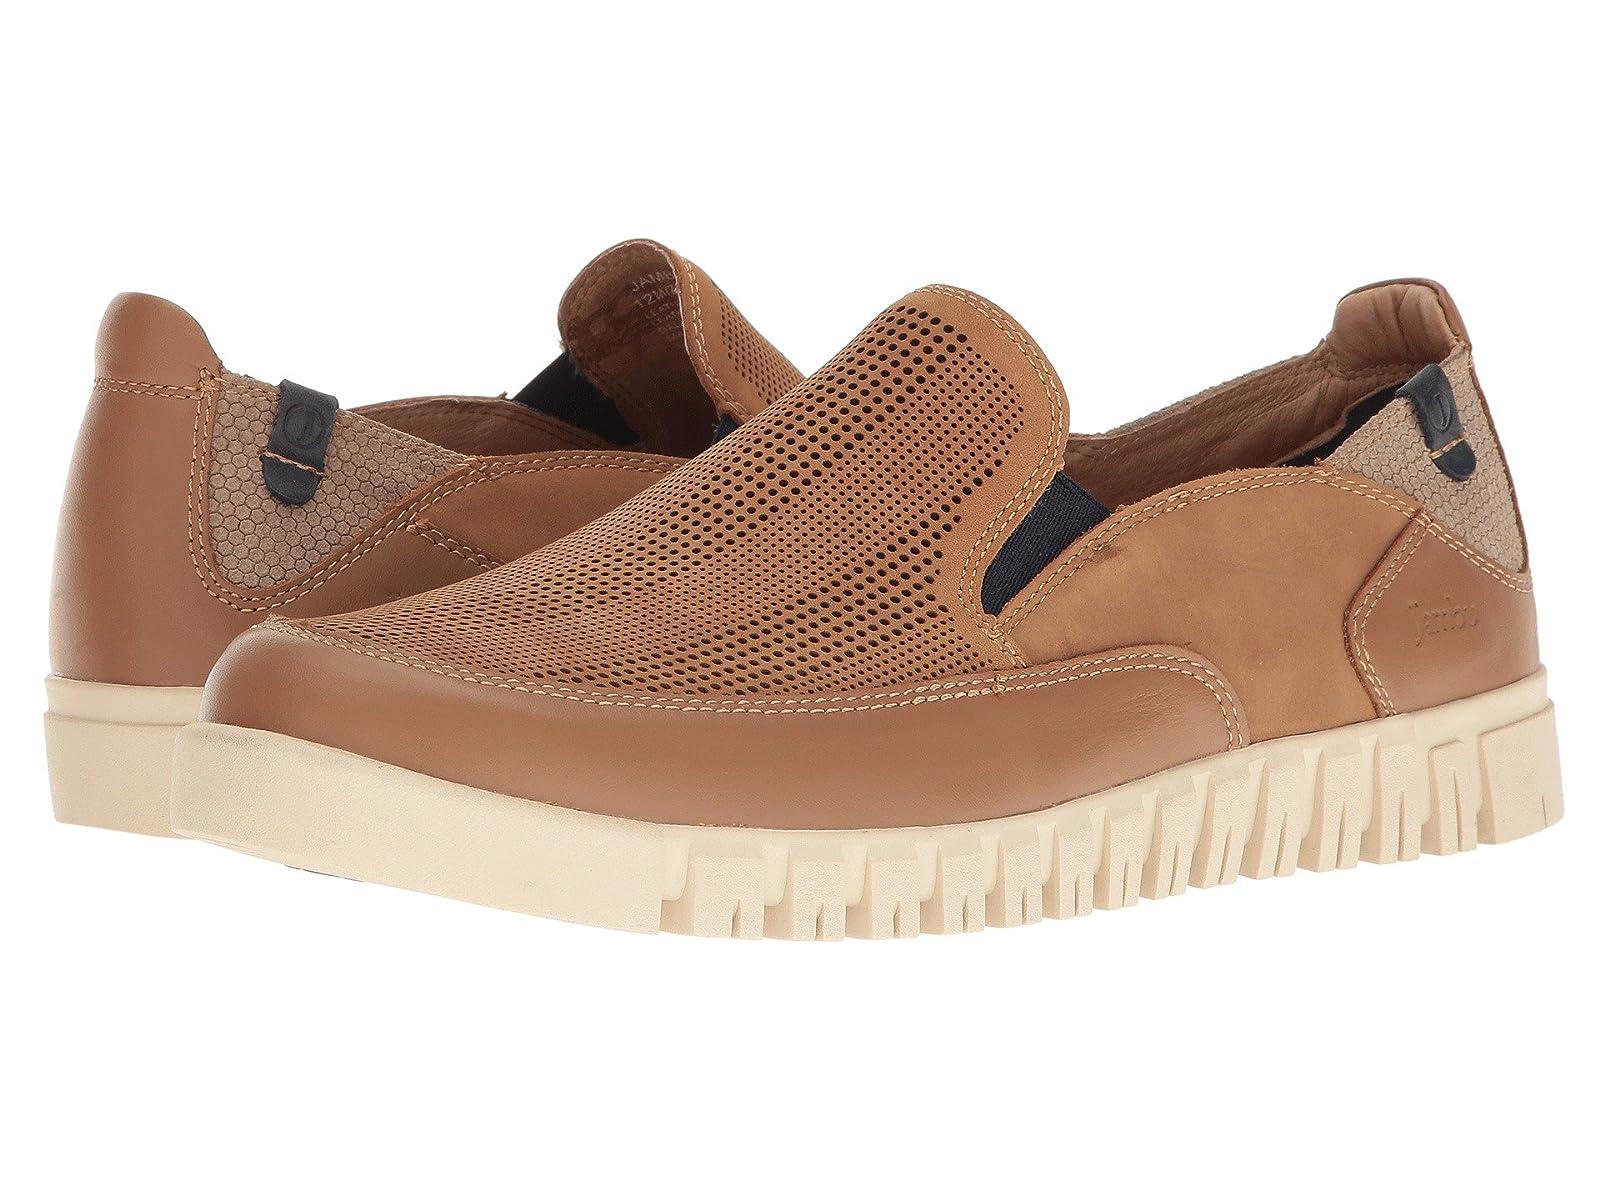 Jambu ZionCheap and distinctive eye-catching shoes